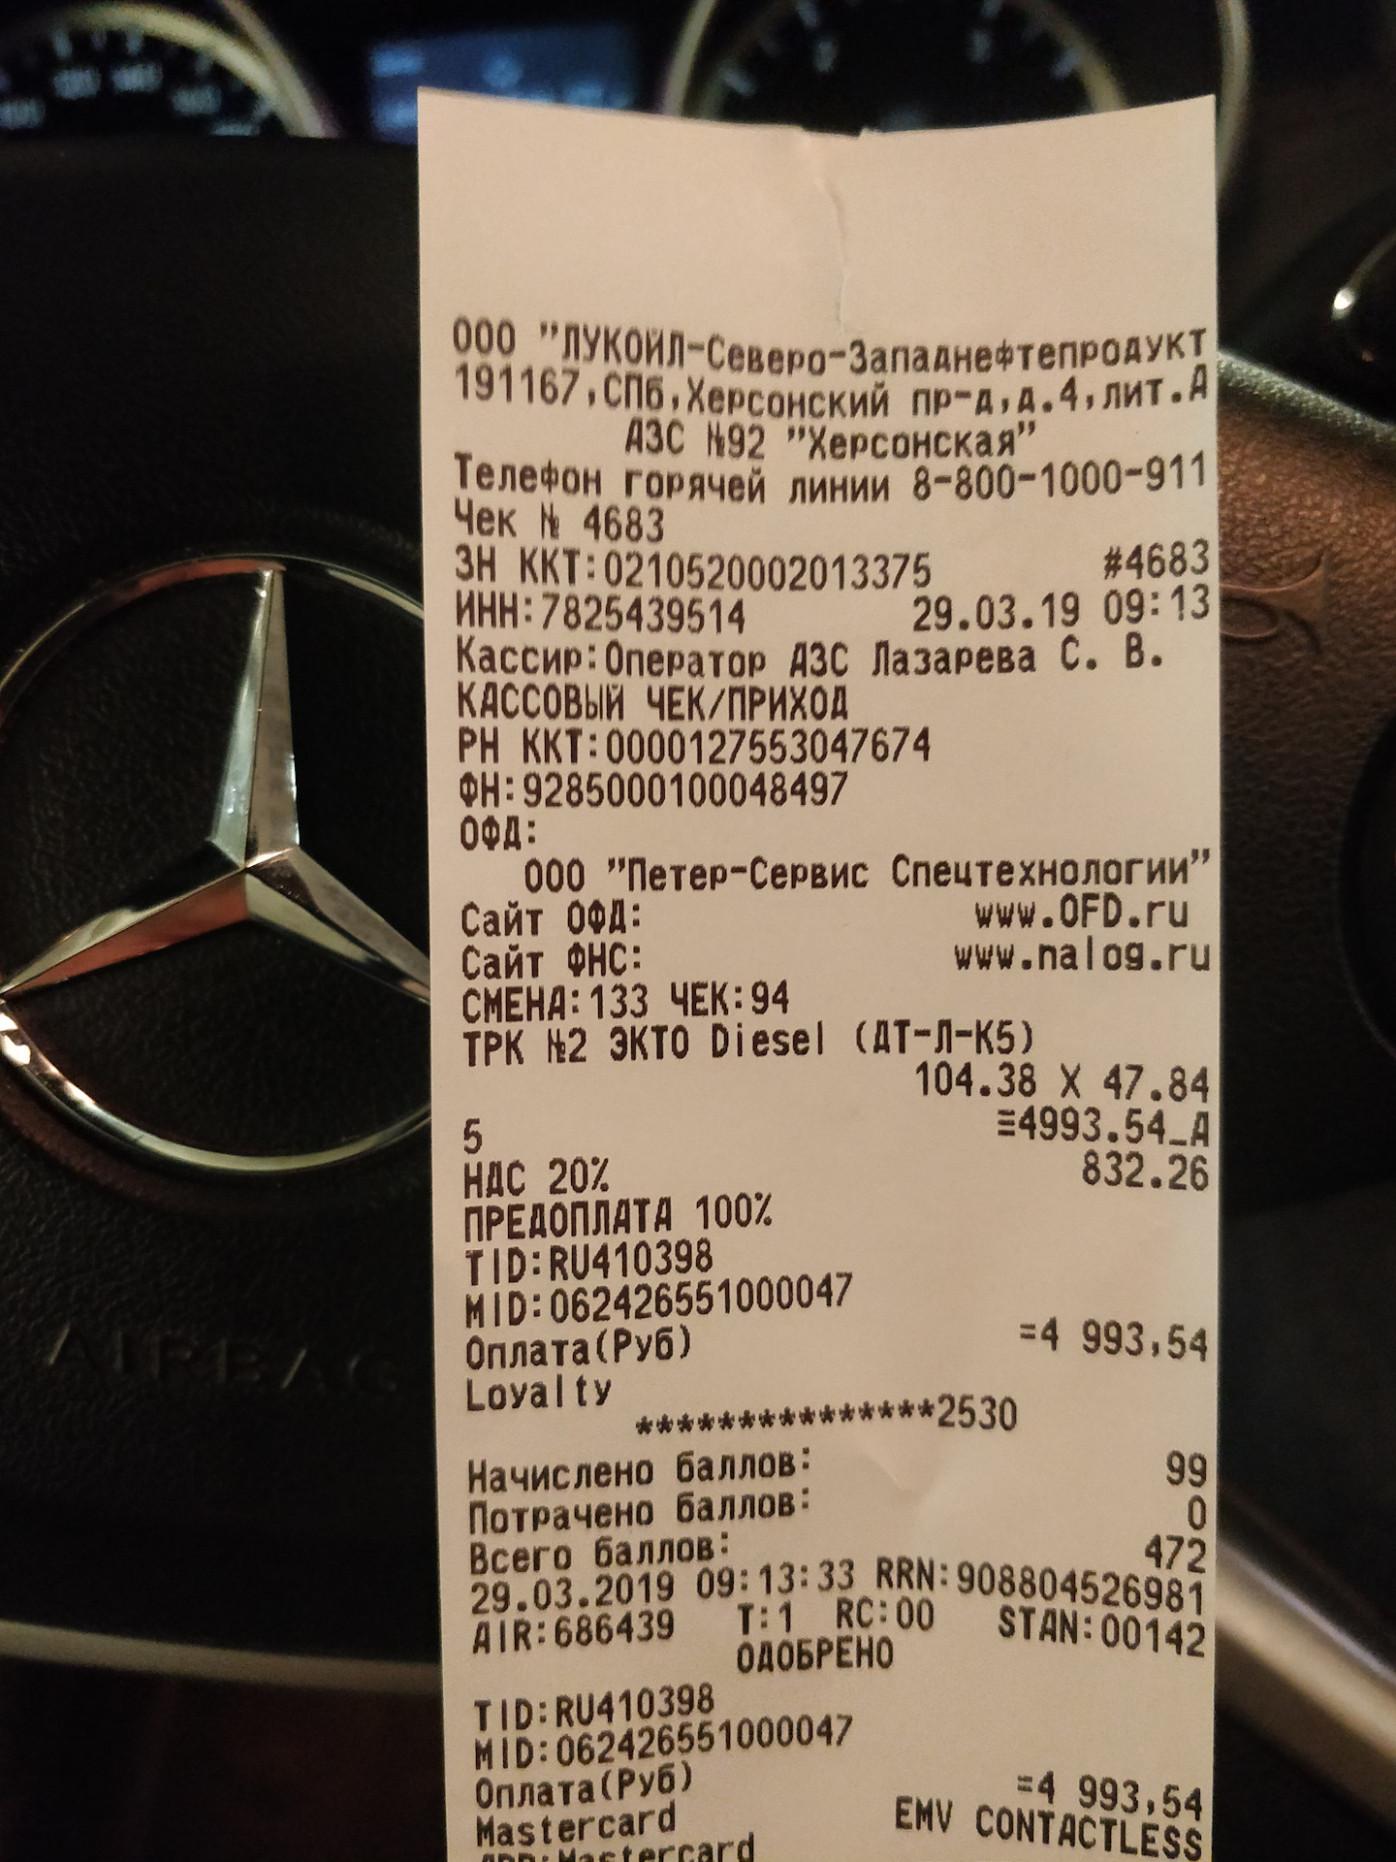 Images 2022 Mercedes-Benz M-Class